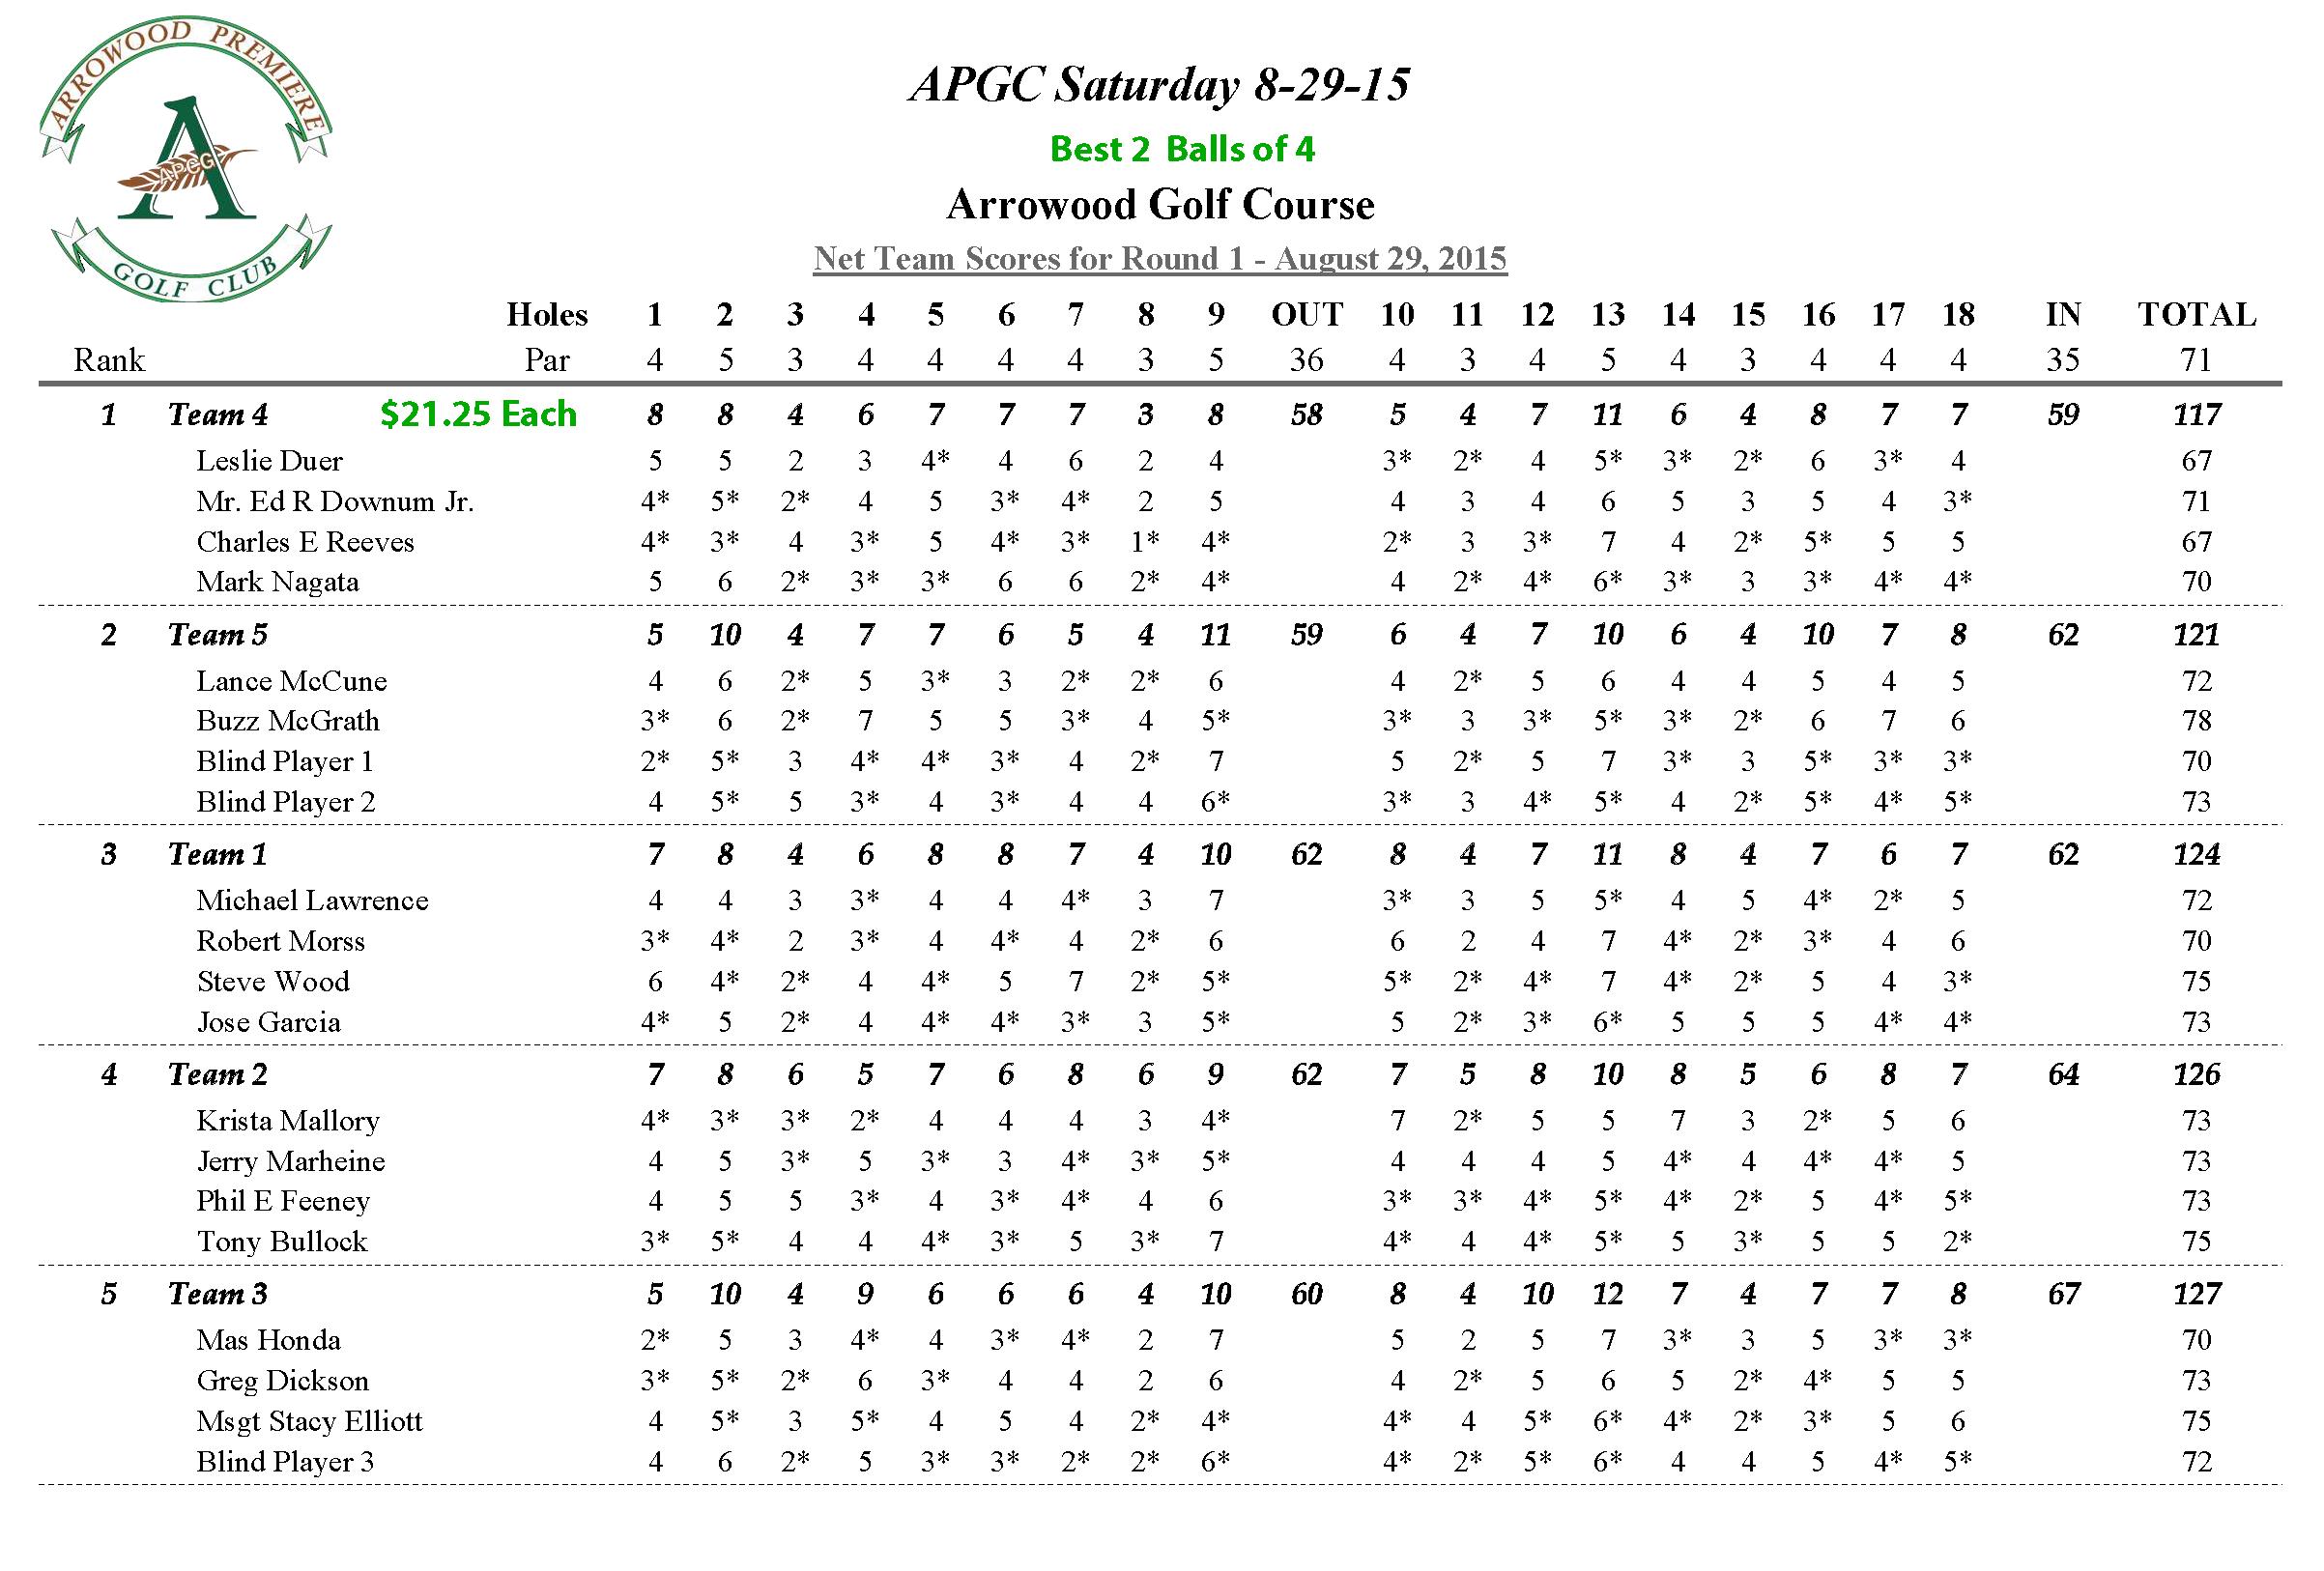 APGC Saturday 8-29-15